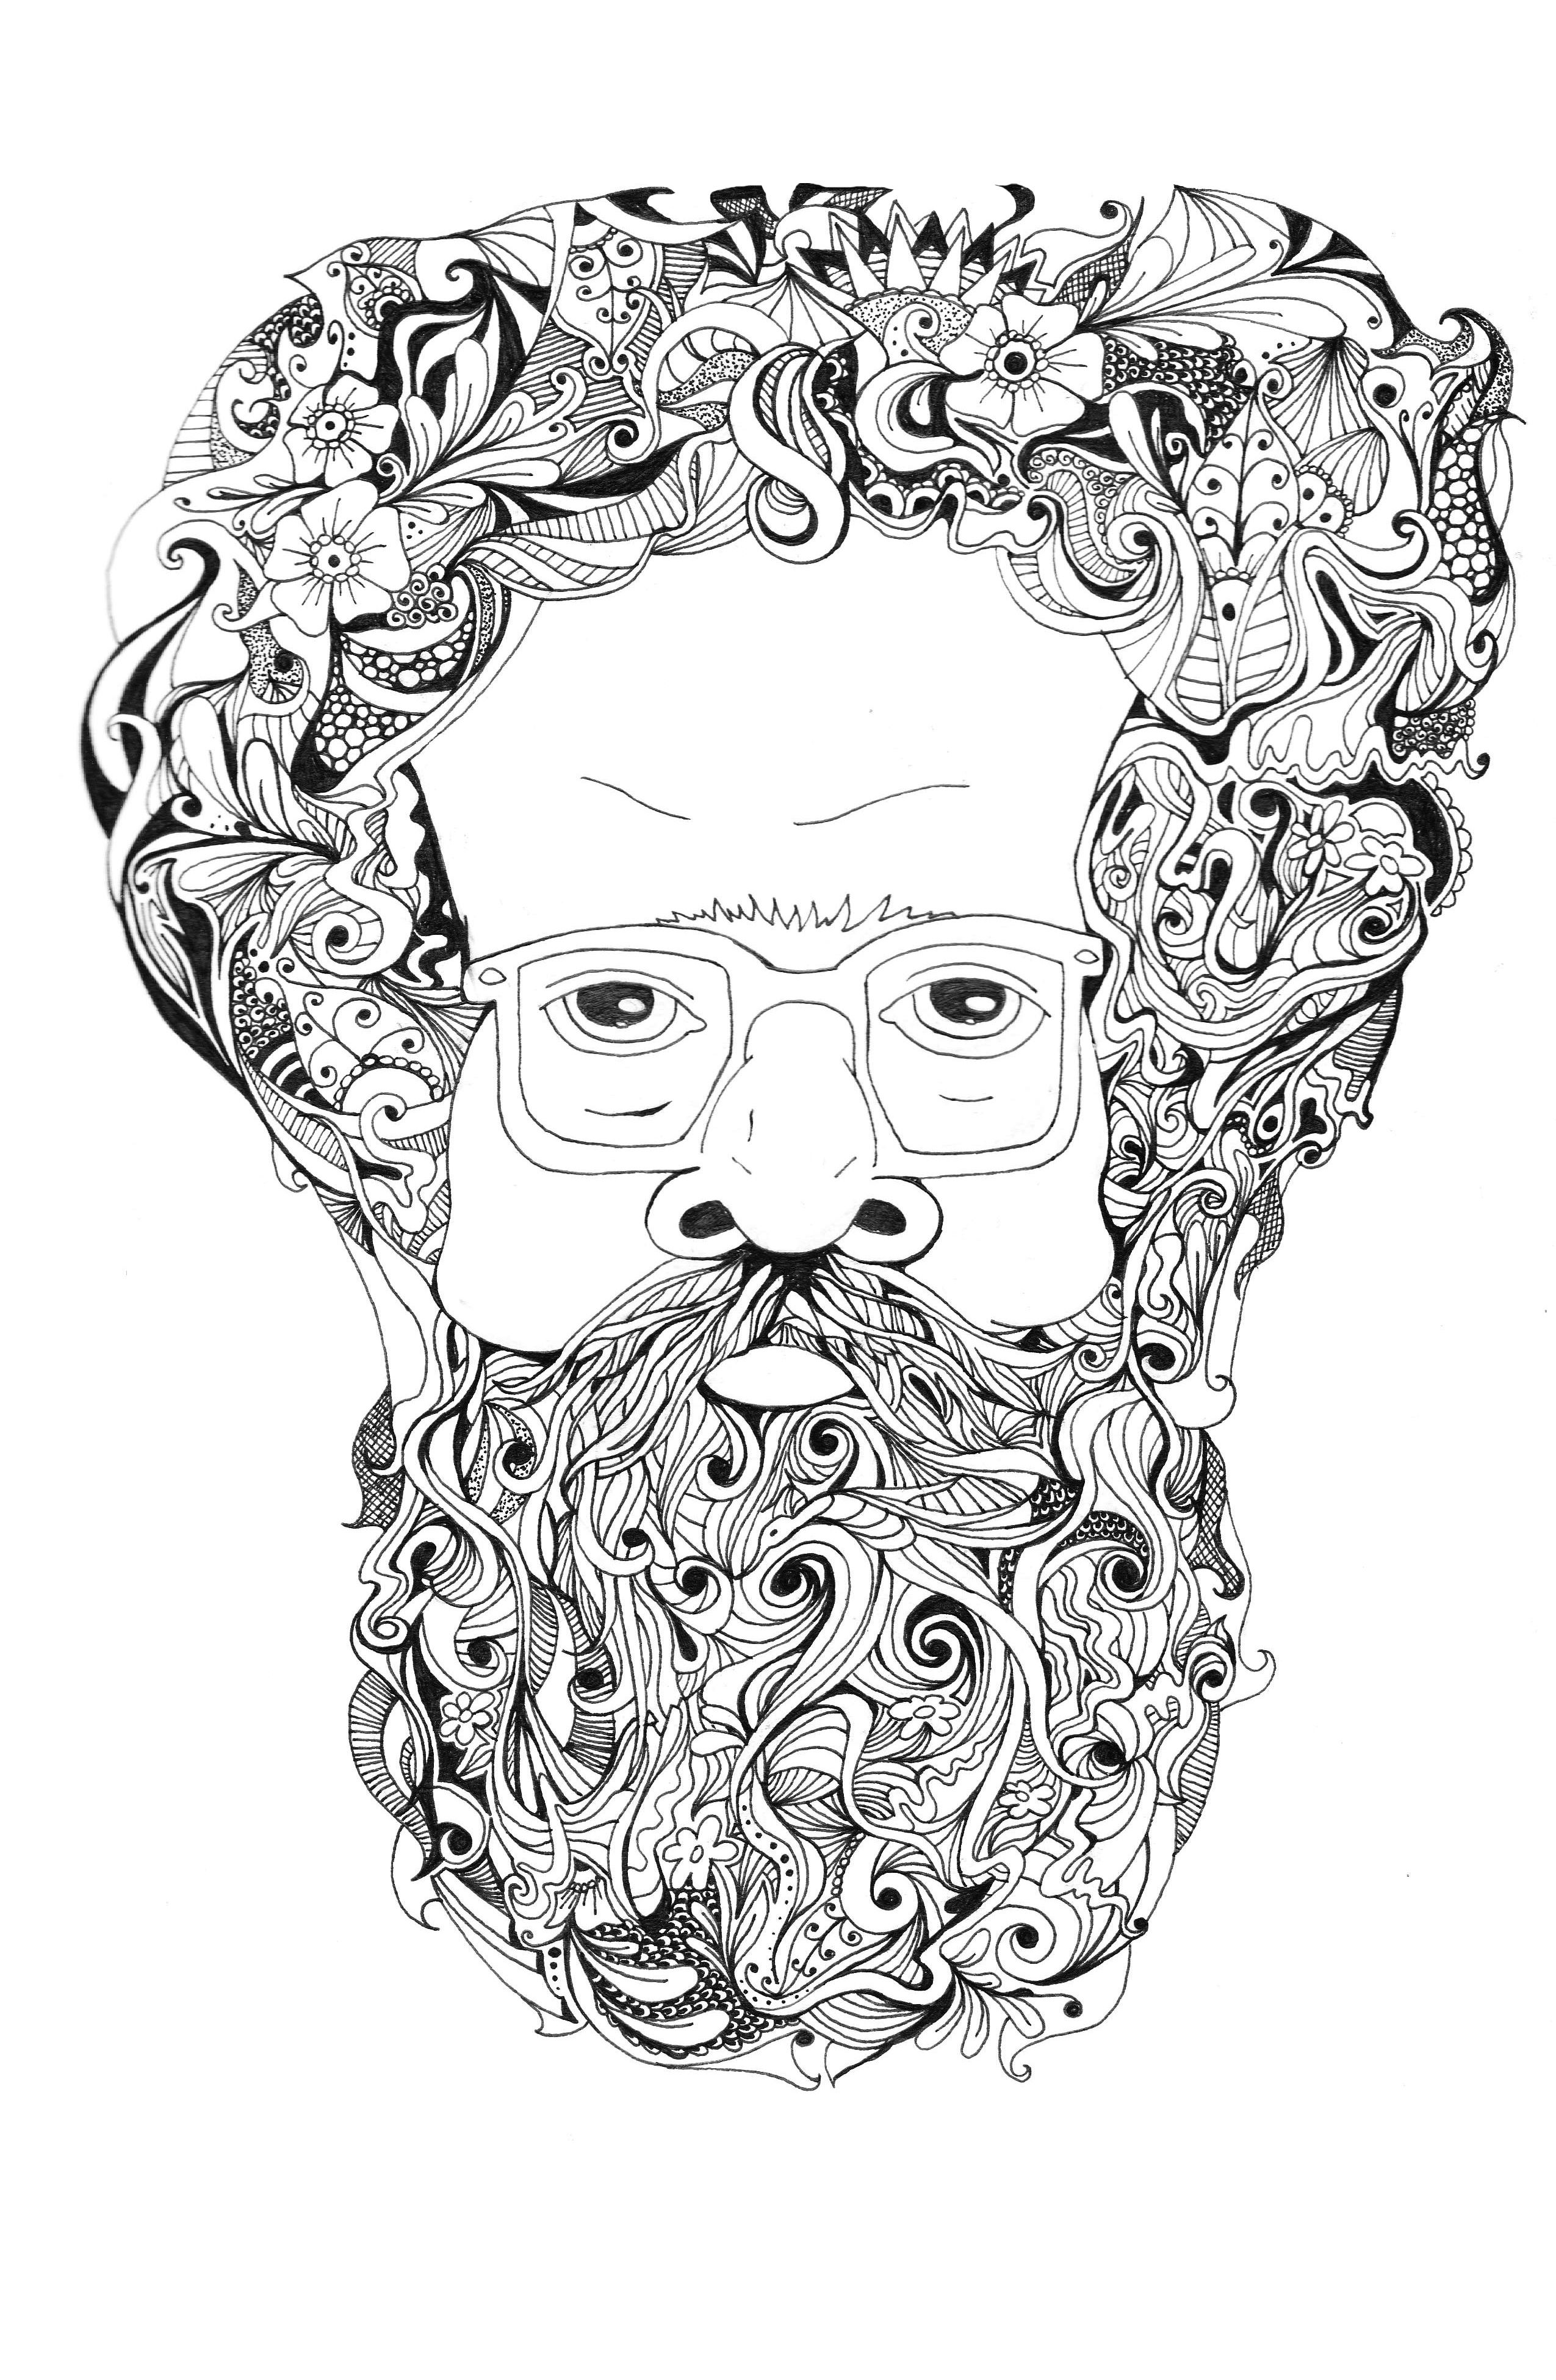 Illustration Beard Wallpapers HD Free Wallpaper